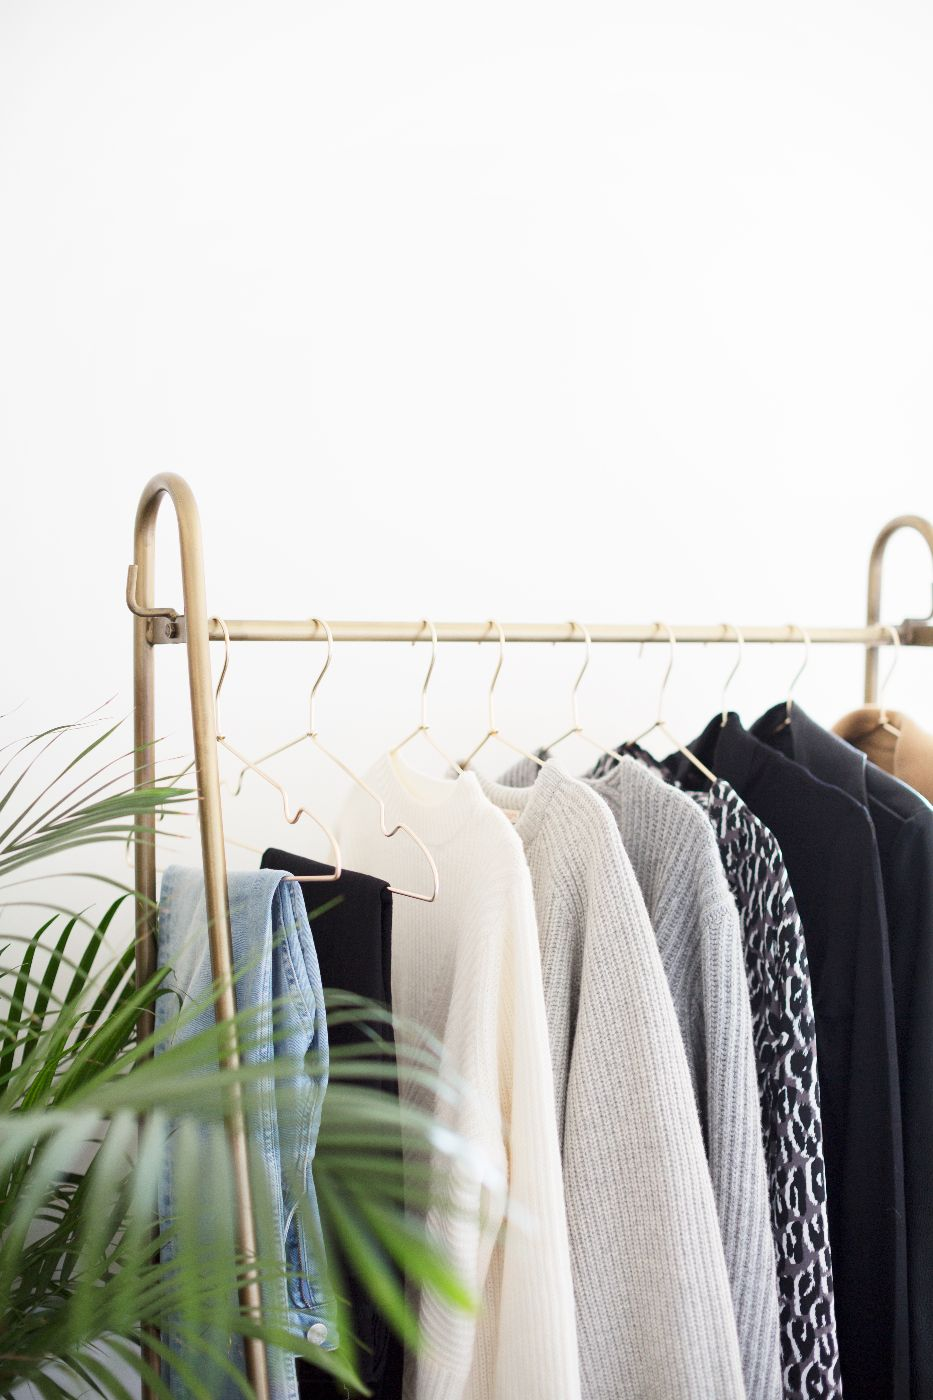 theannaedit-autumn-capsule-wardrobe-most-worn-september-2017-3